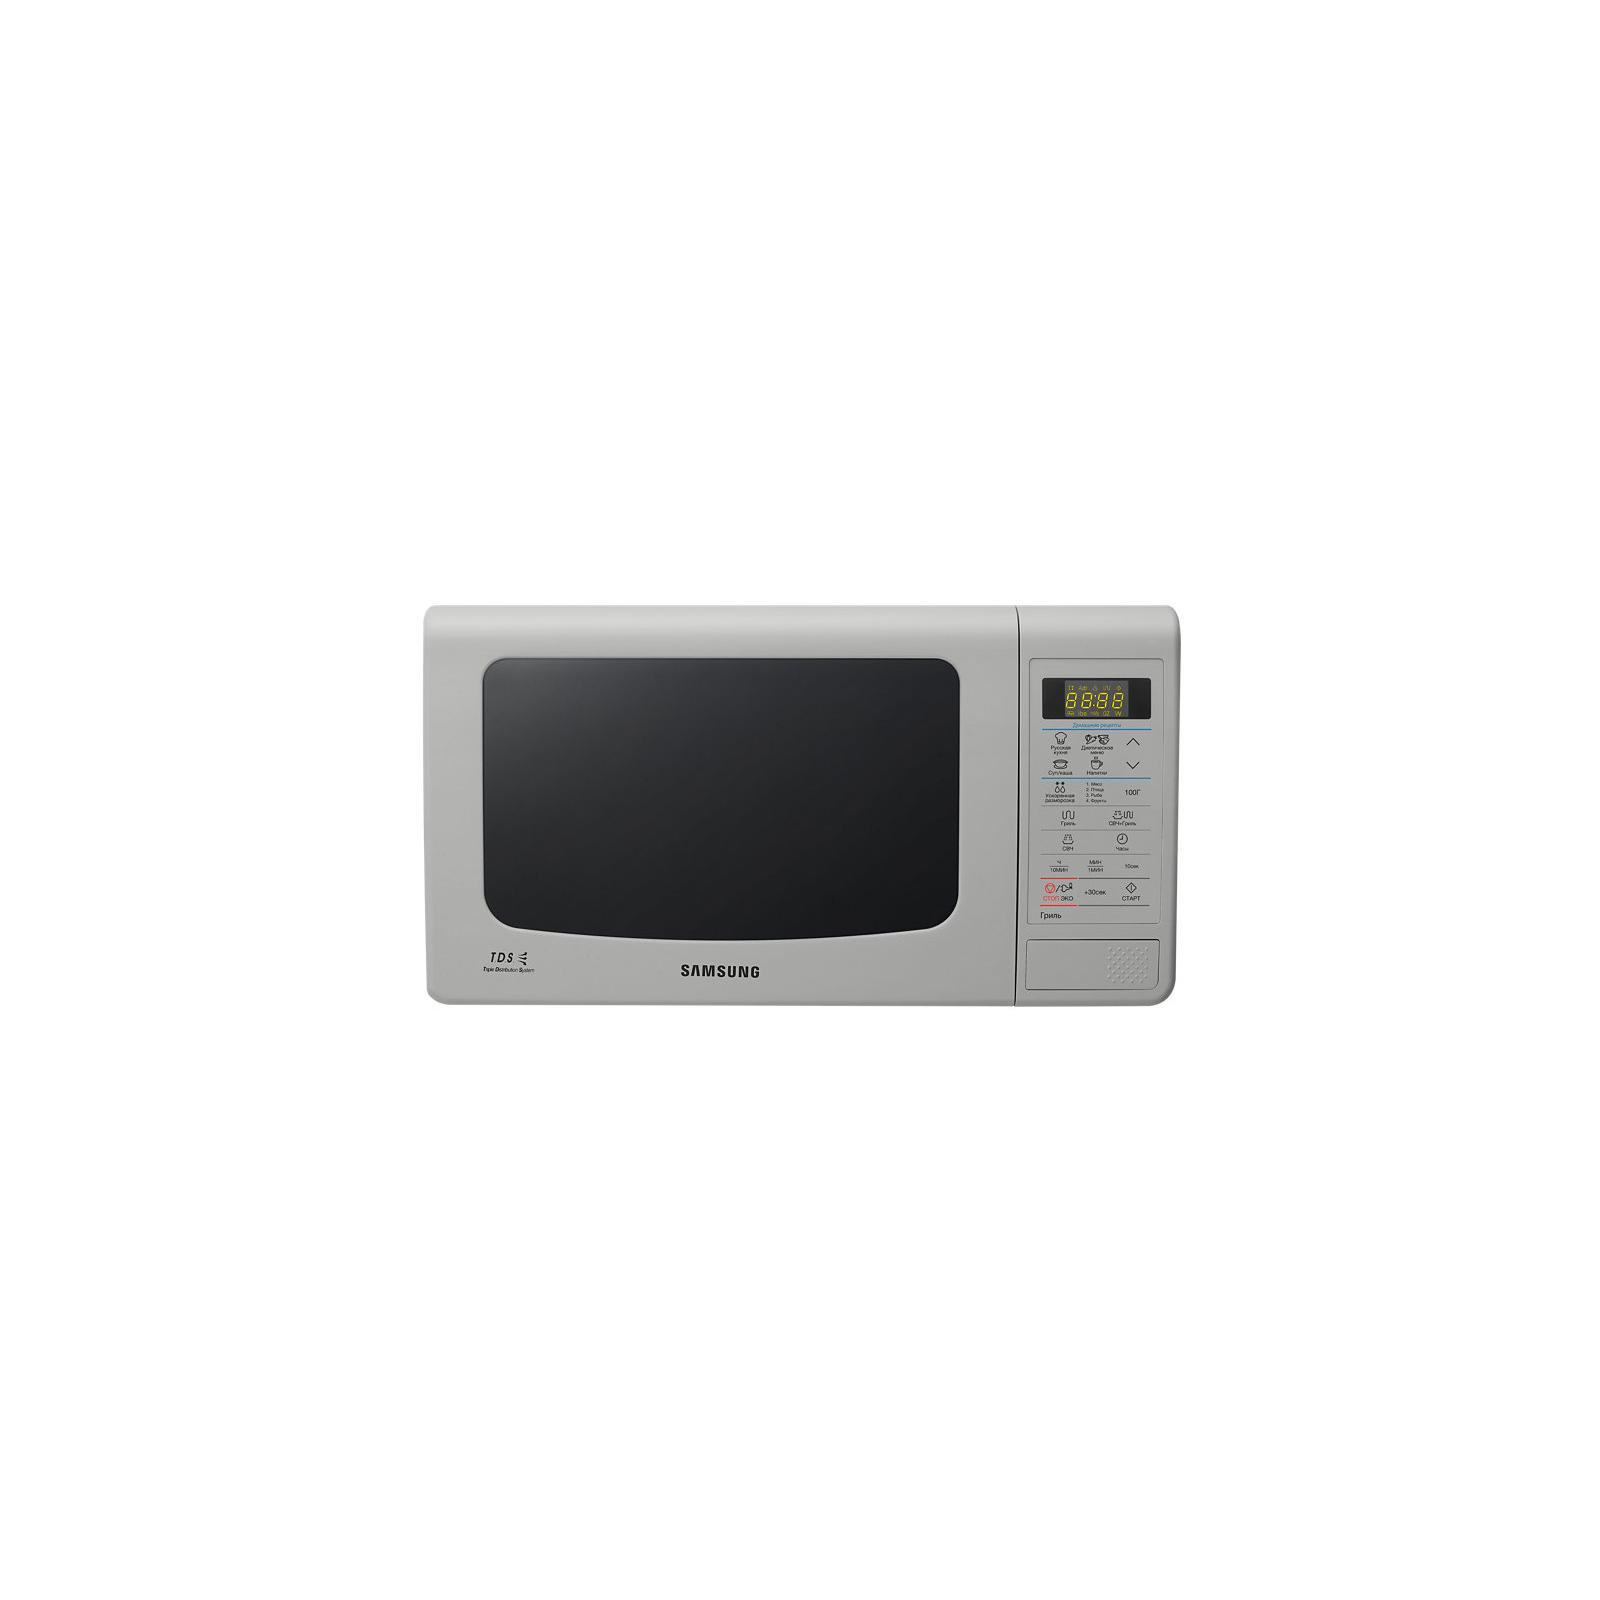 Микроволновая печь Samsung GE 83 KRS-3/BW (GE83KRS-3/BW)